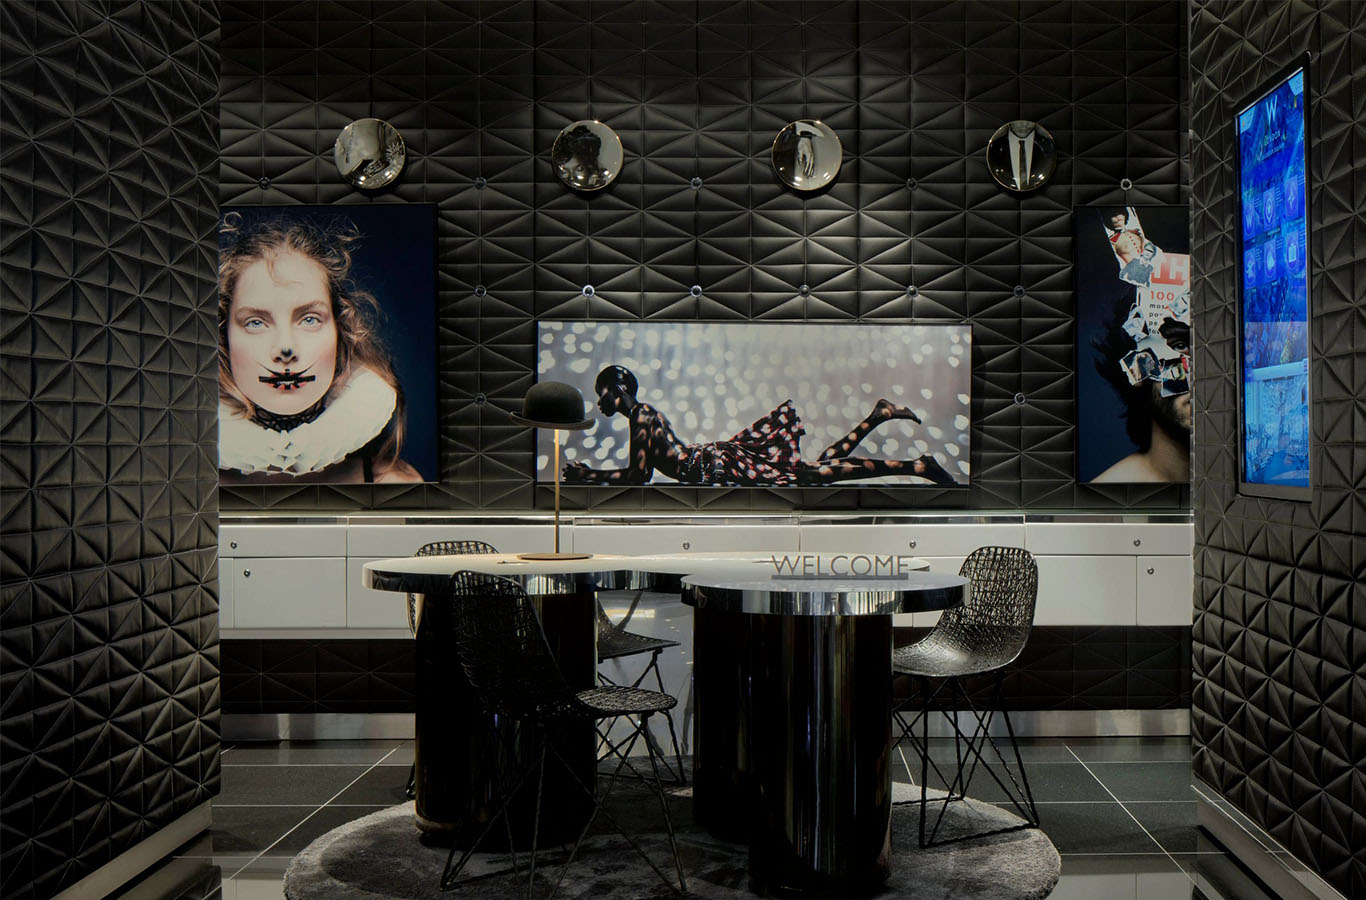 Polished Black Granite Tiles - The W Hotel Lobby